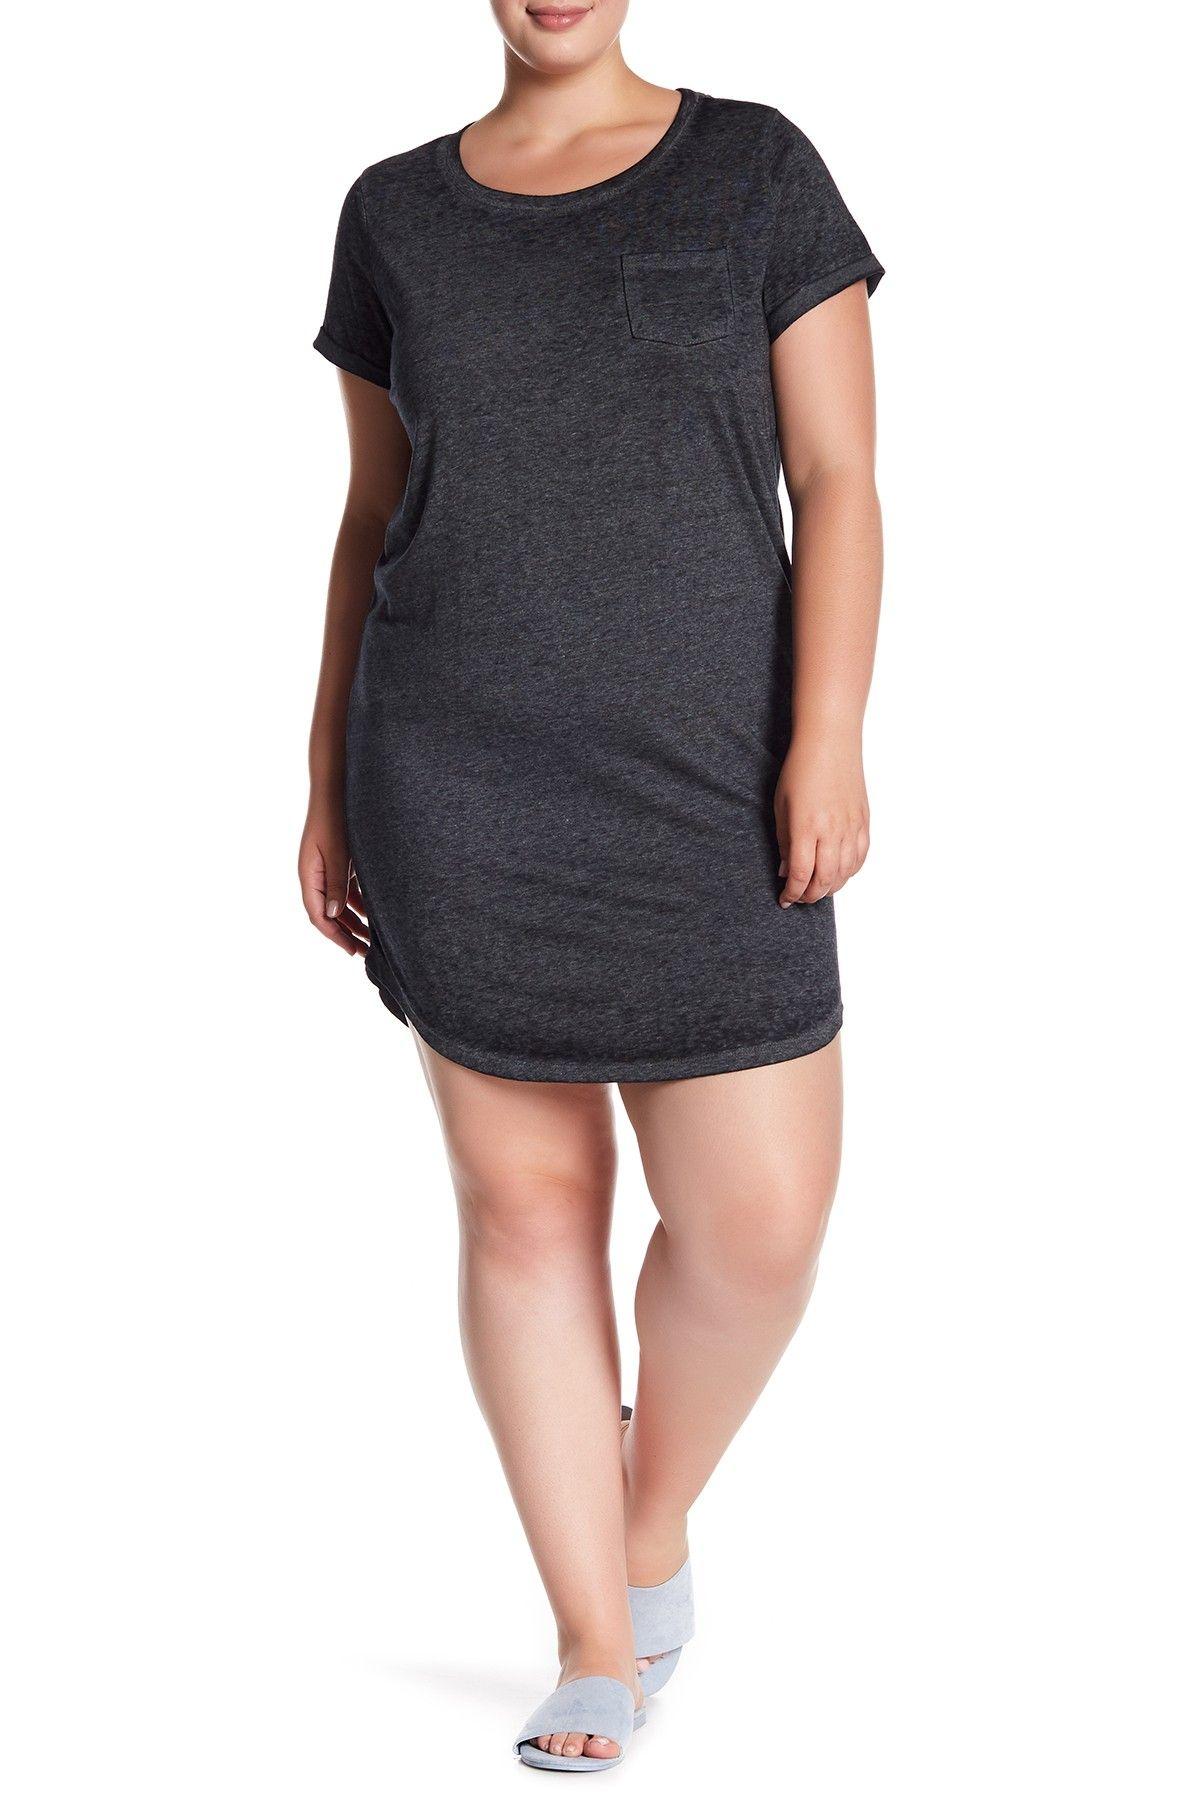 2be81cc14cb3e Image of PLANET GOLD Scoop Neck T-Shirt Dress (Plus Size)